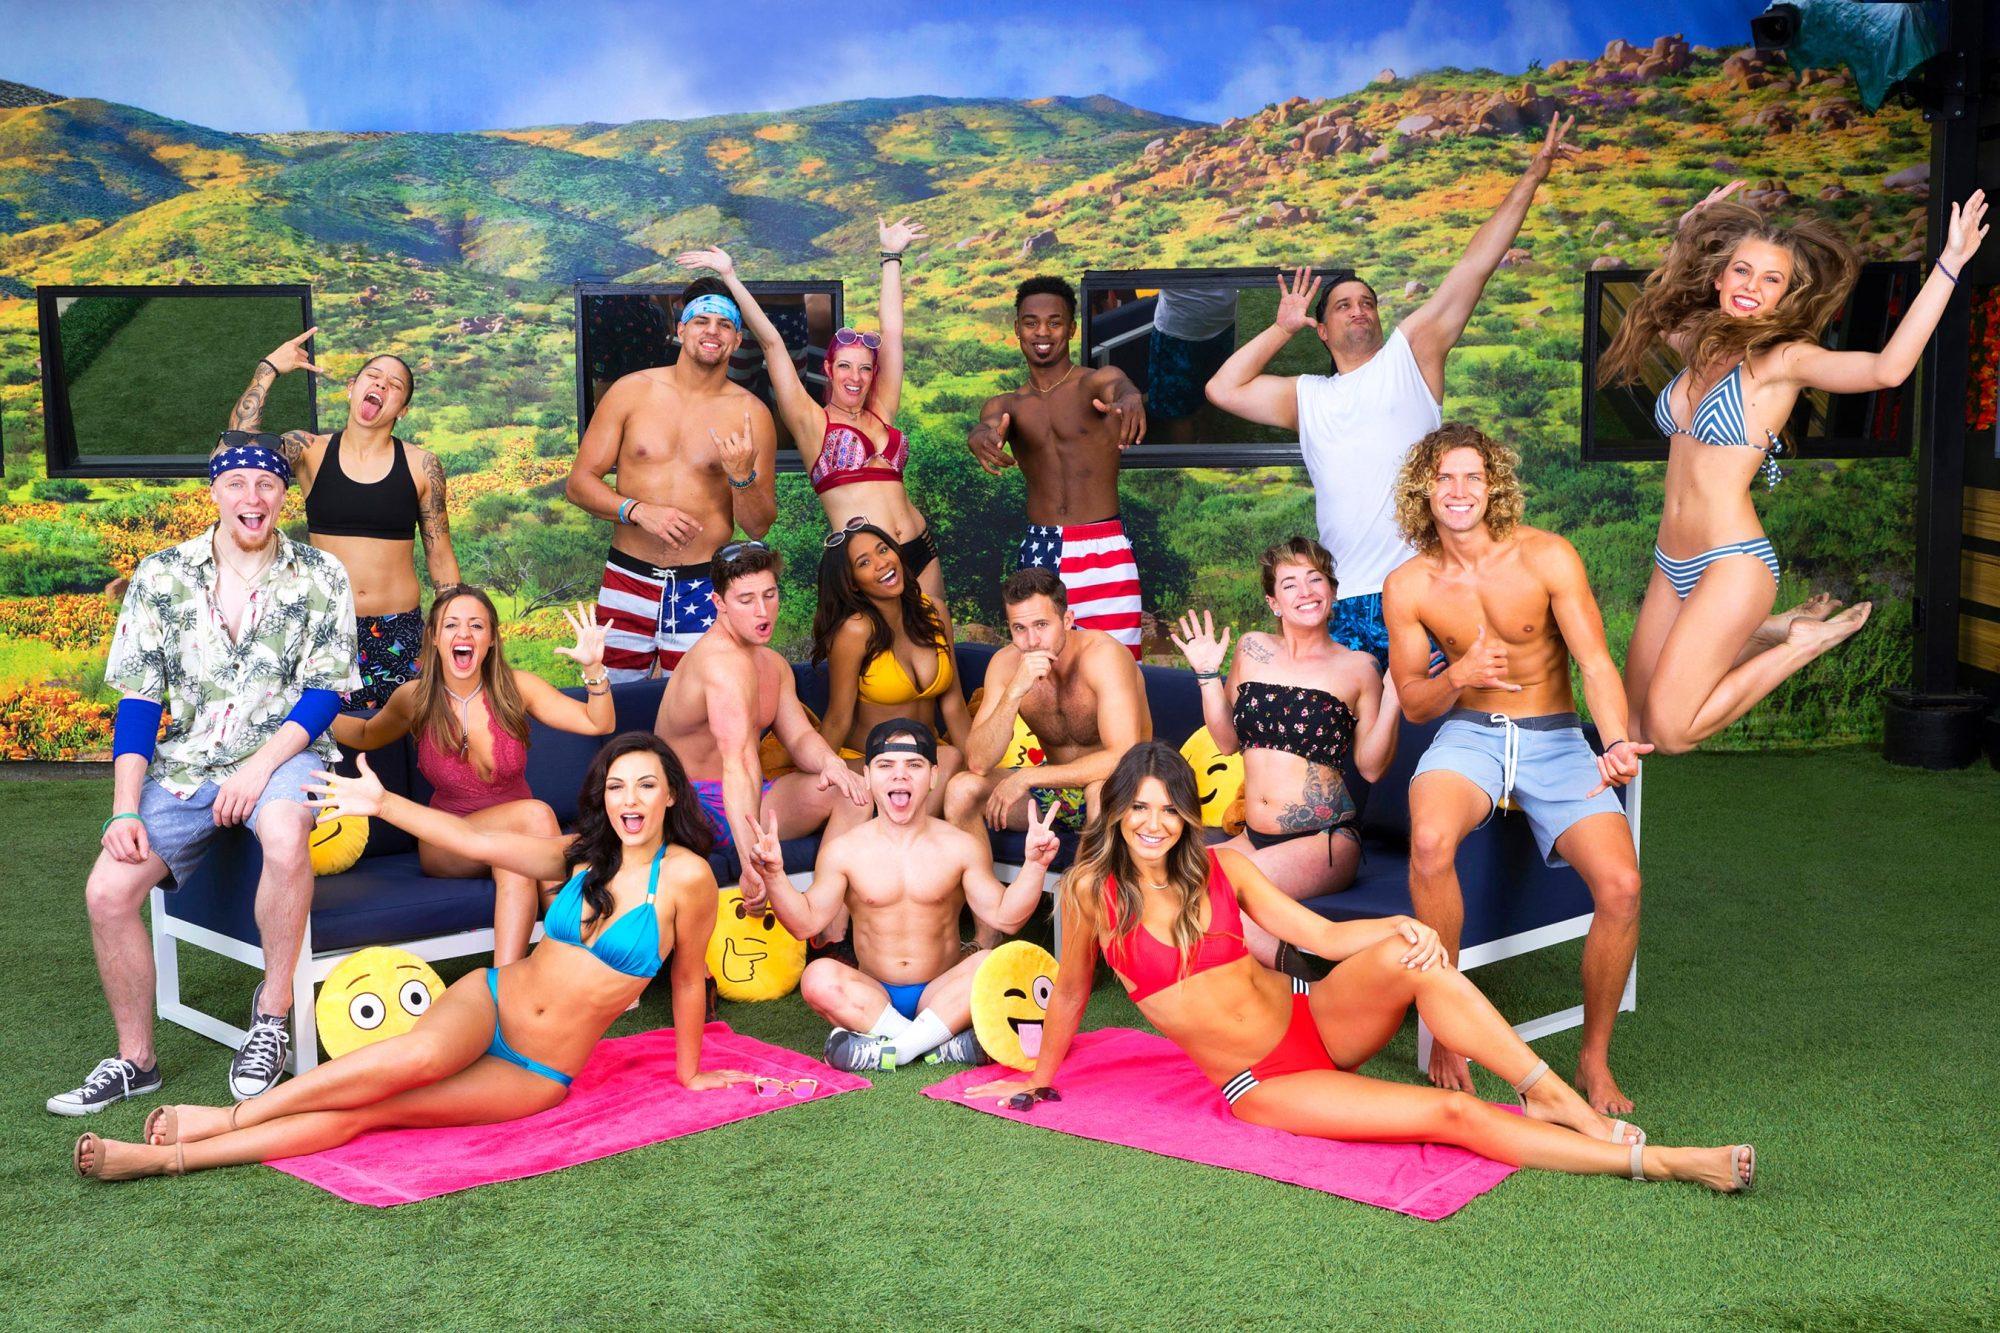 big brother season 20 episode 2 free online